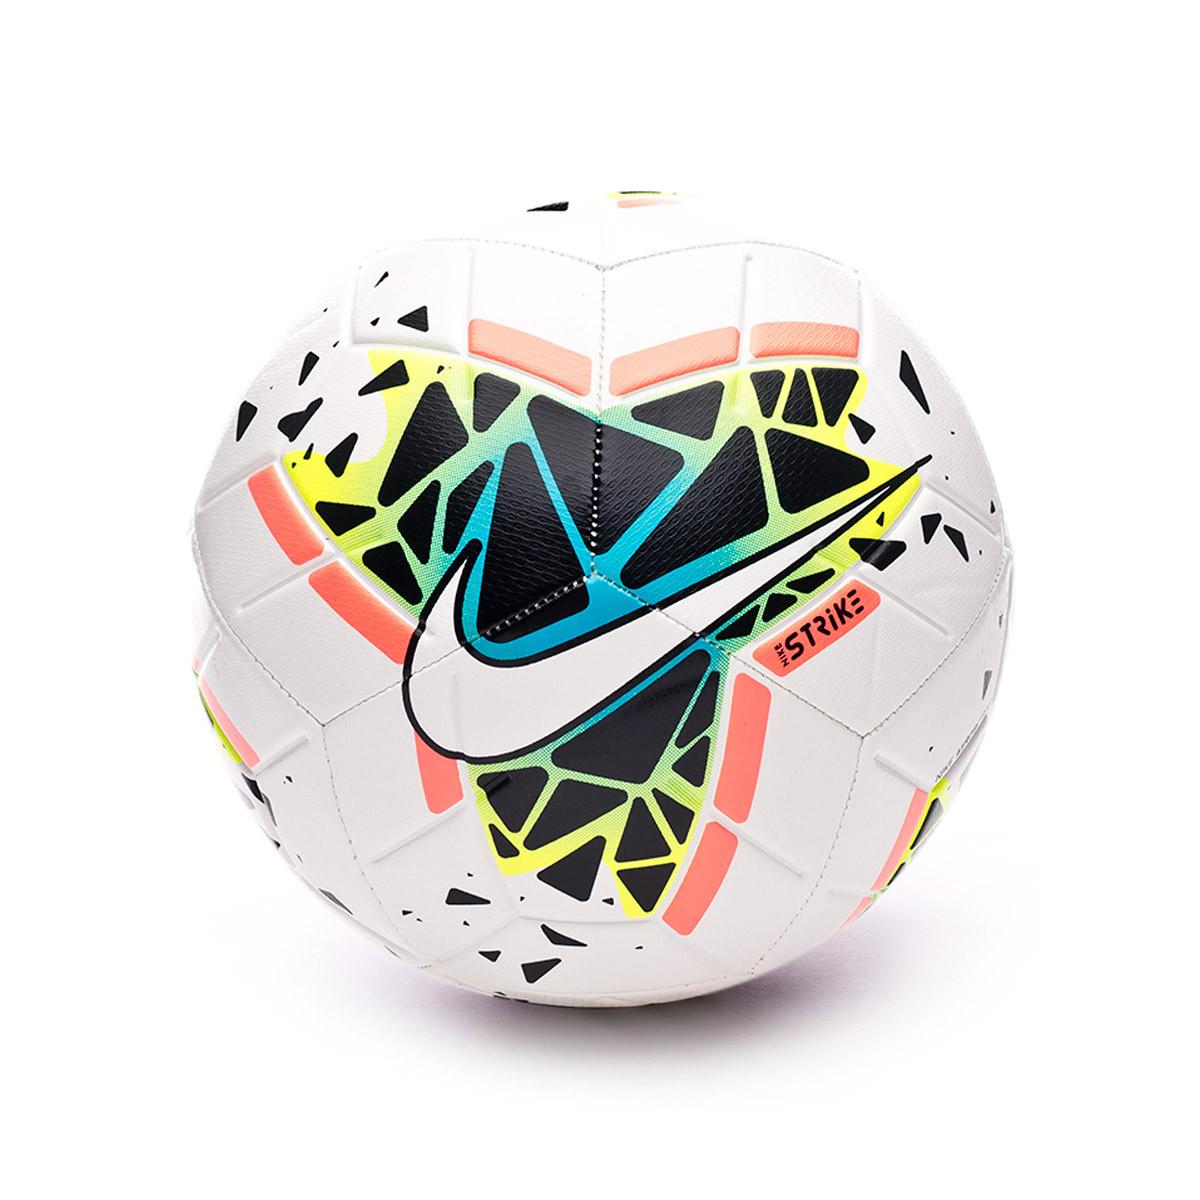 Bola de Futebol adidas MLS PRO 2019 2020